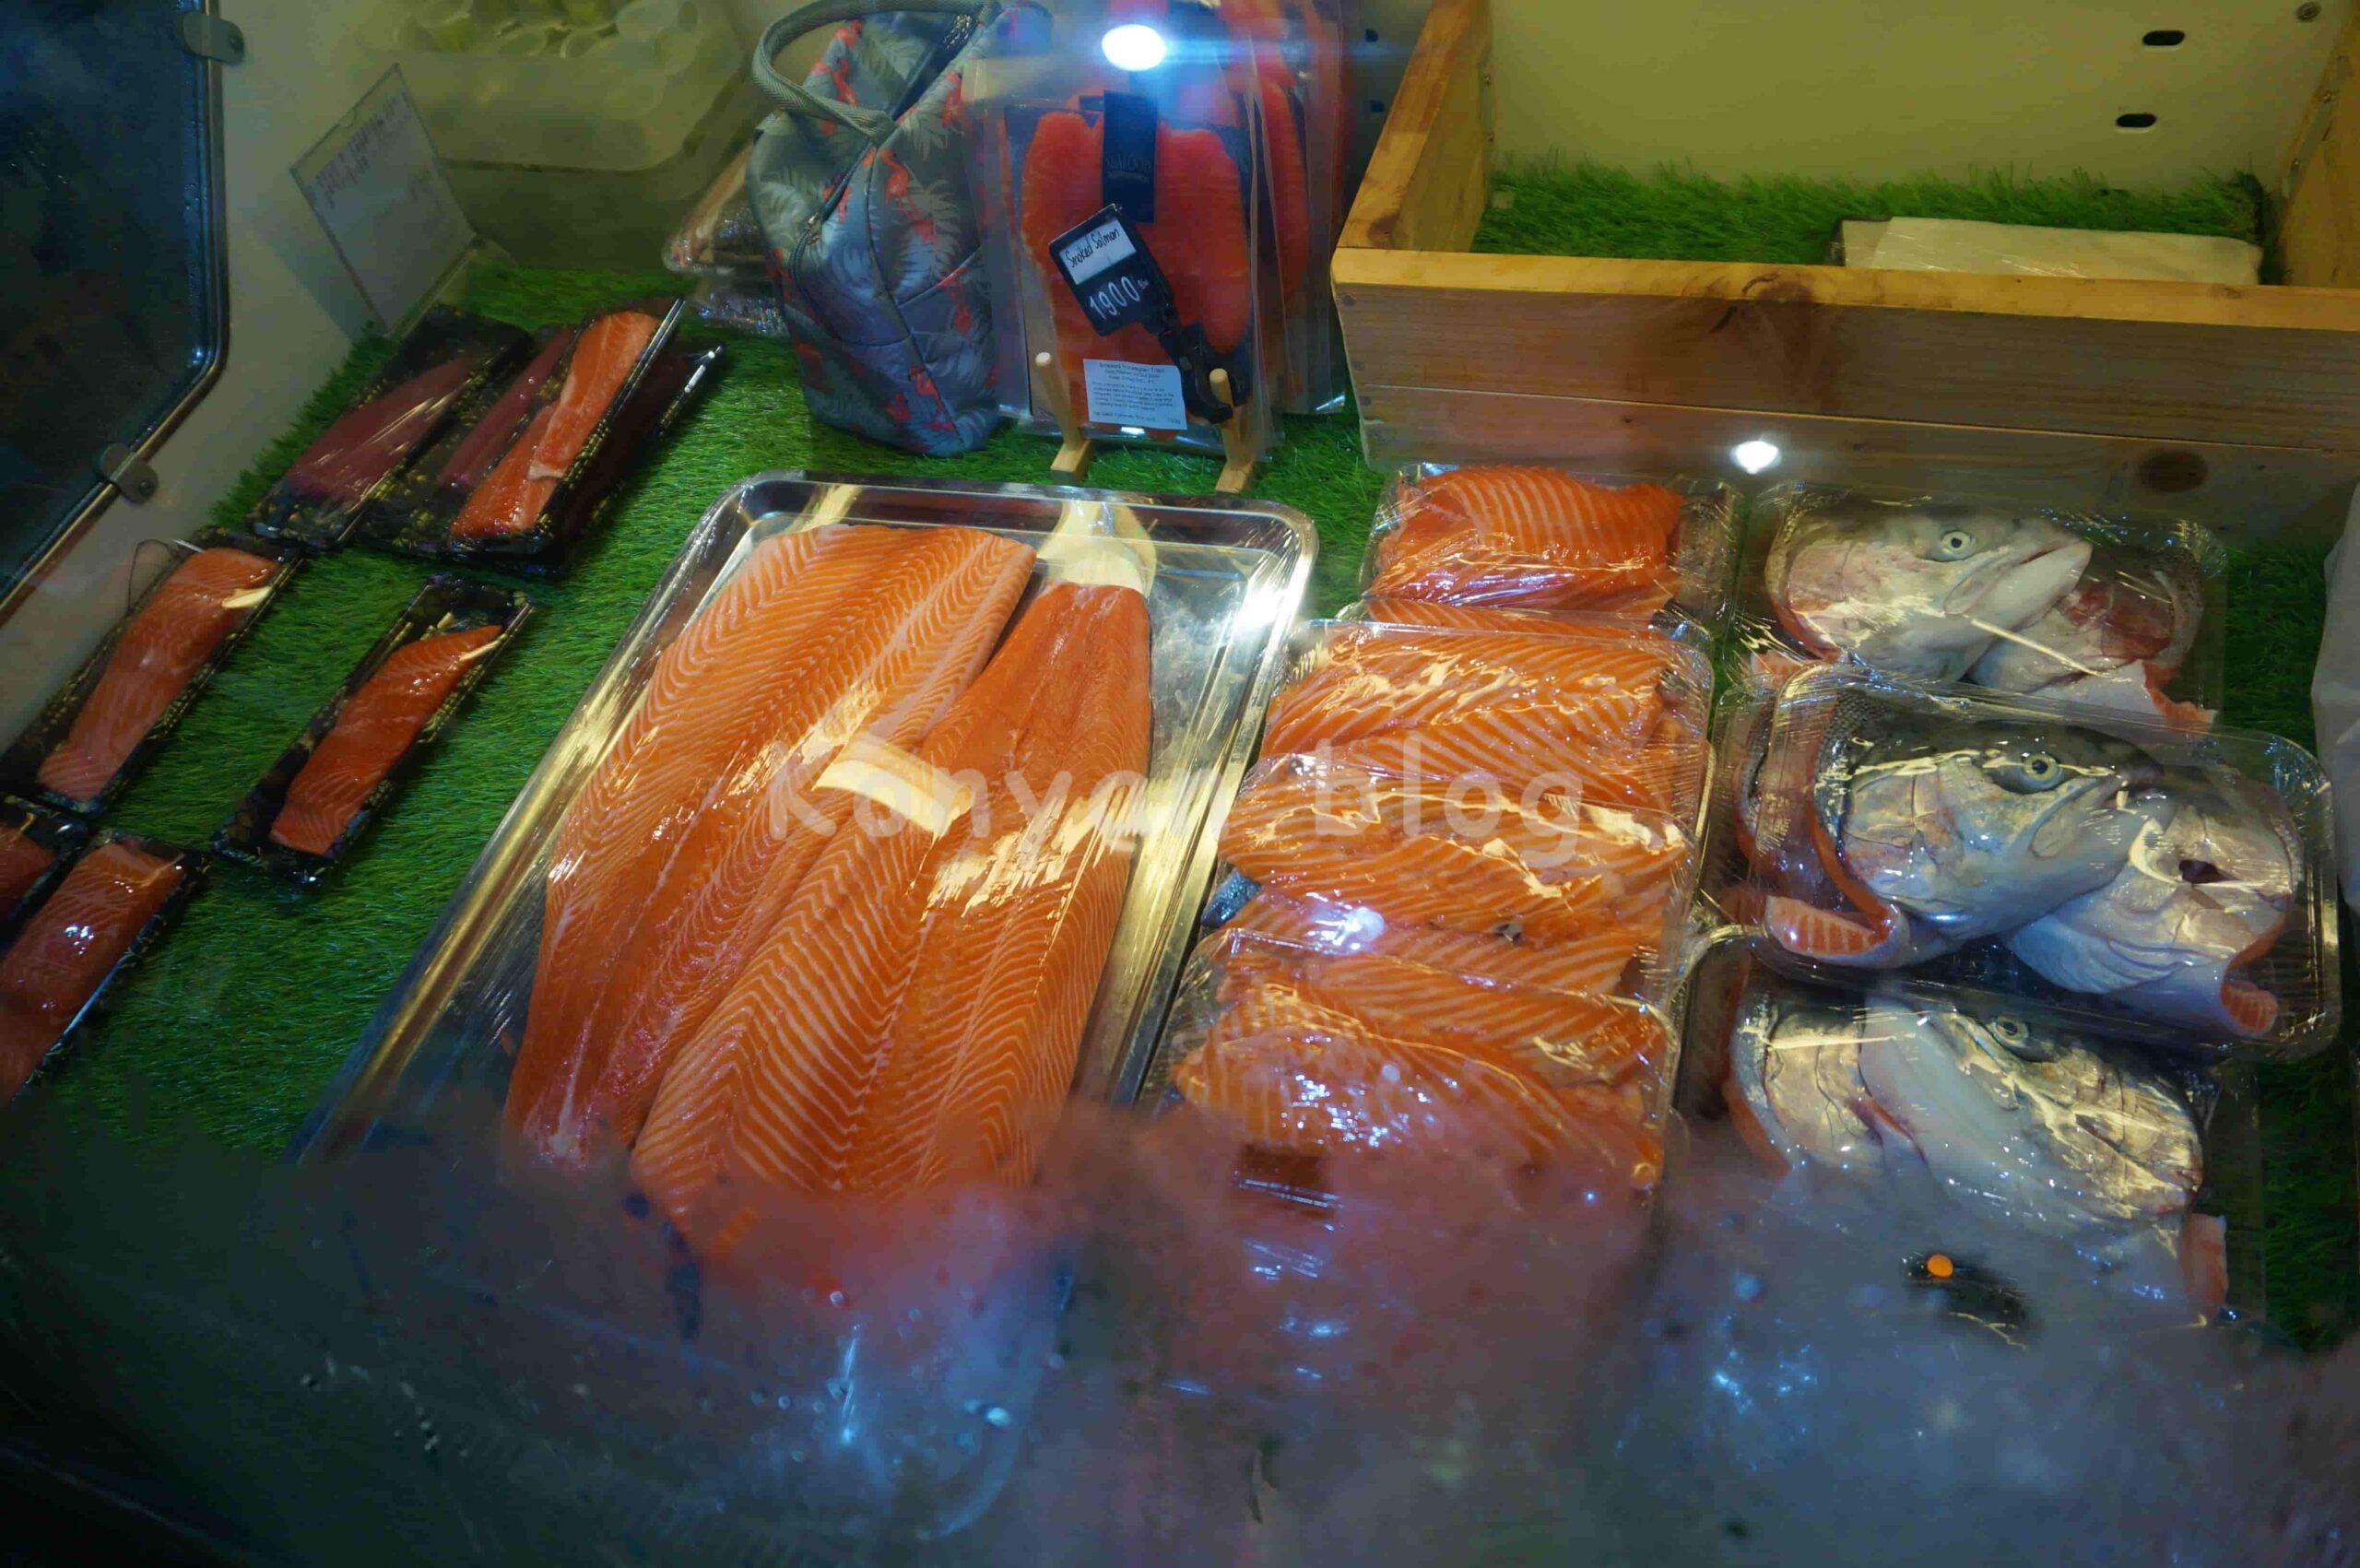 Top Catch Fisheries 一頂魚屋 刺身 Taman Megah